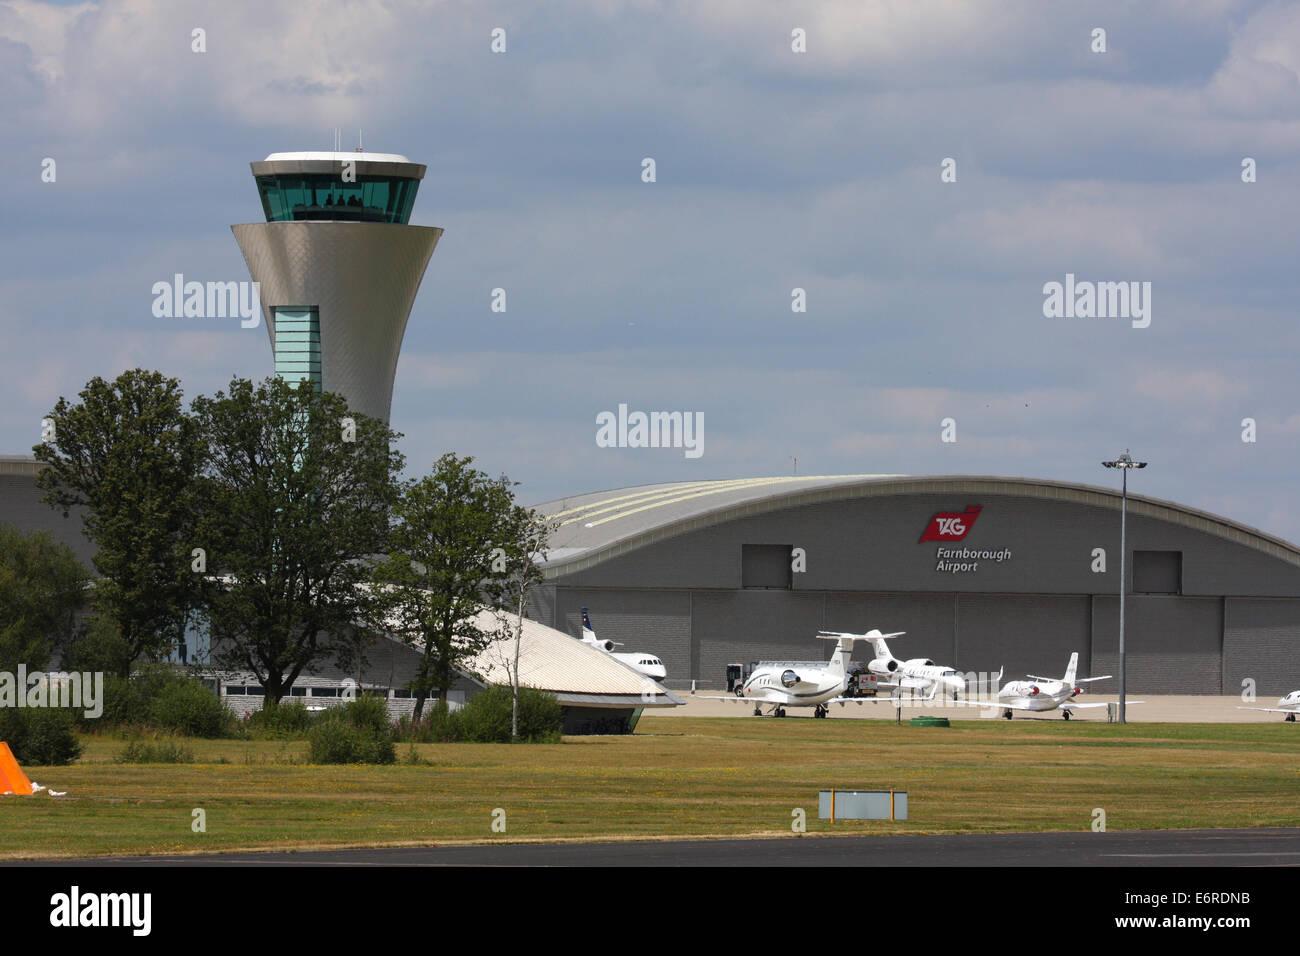 FARNBOROUGH AIRPORT HAMPSHIRE ENGLAND - Stock Image